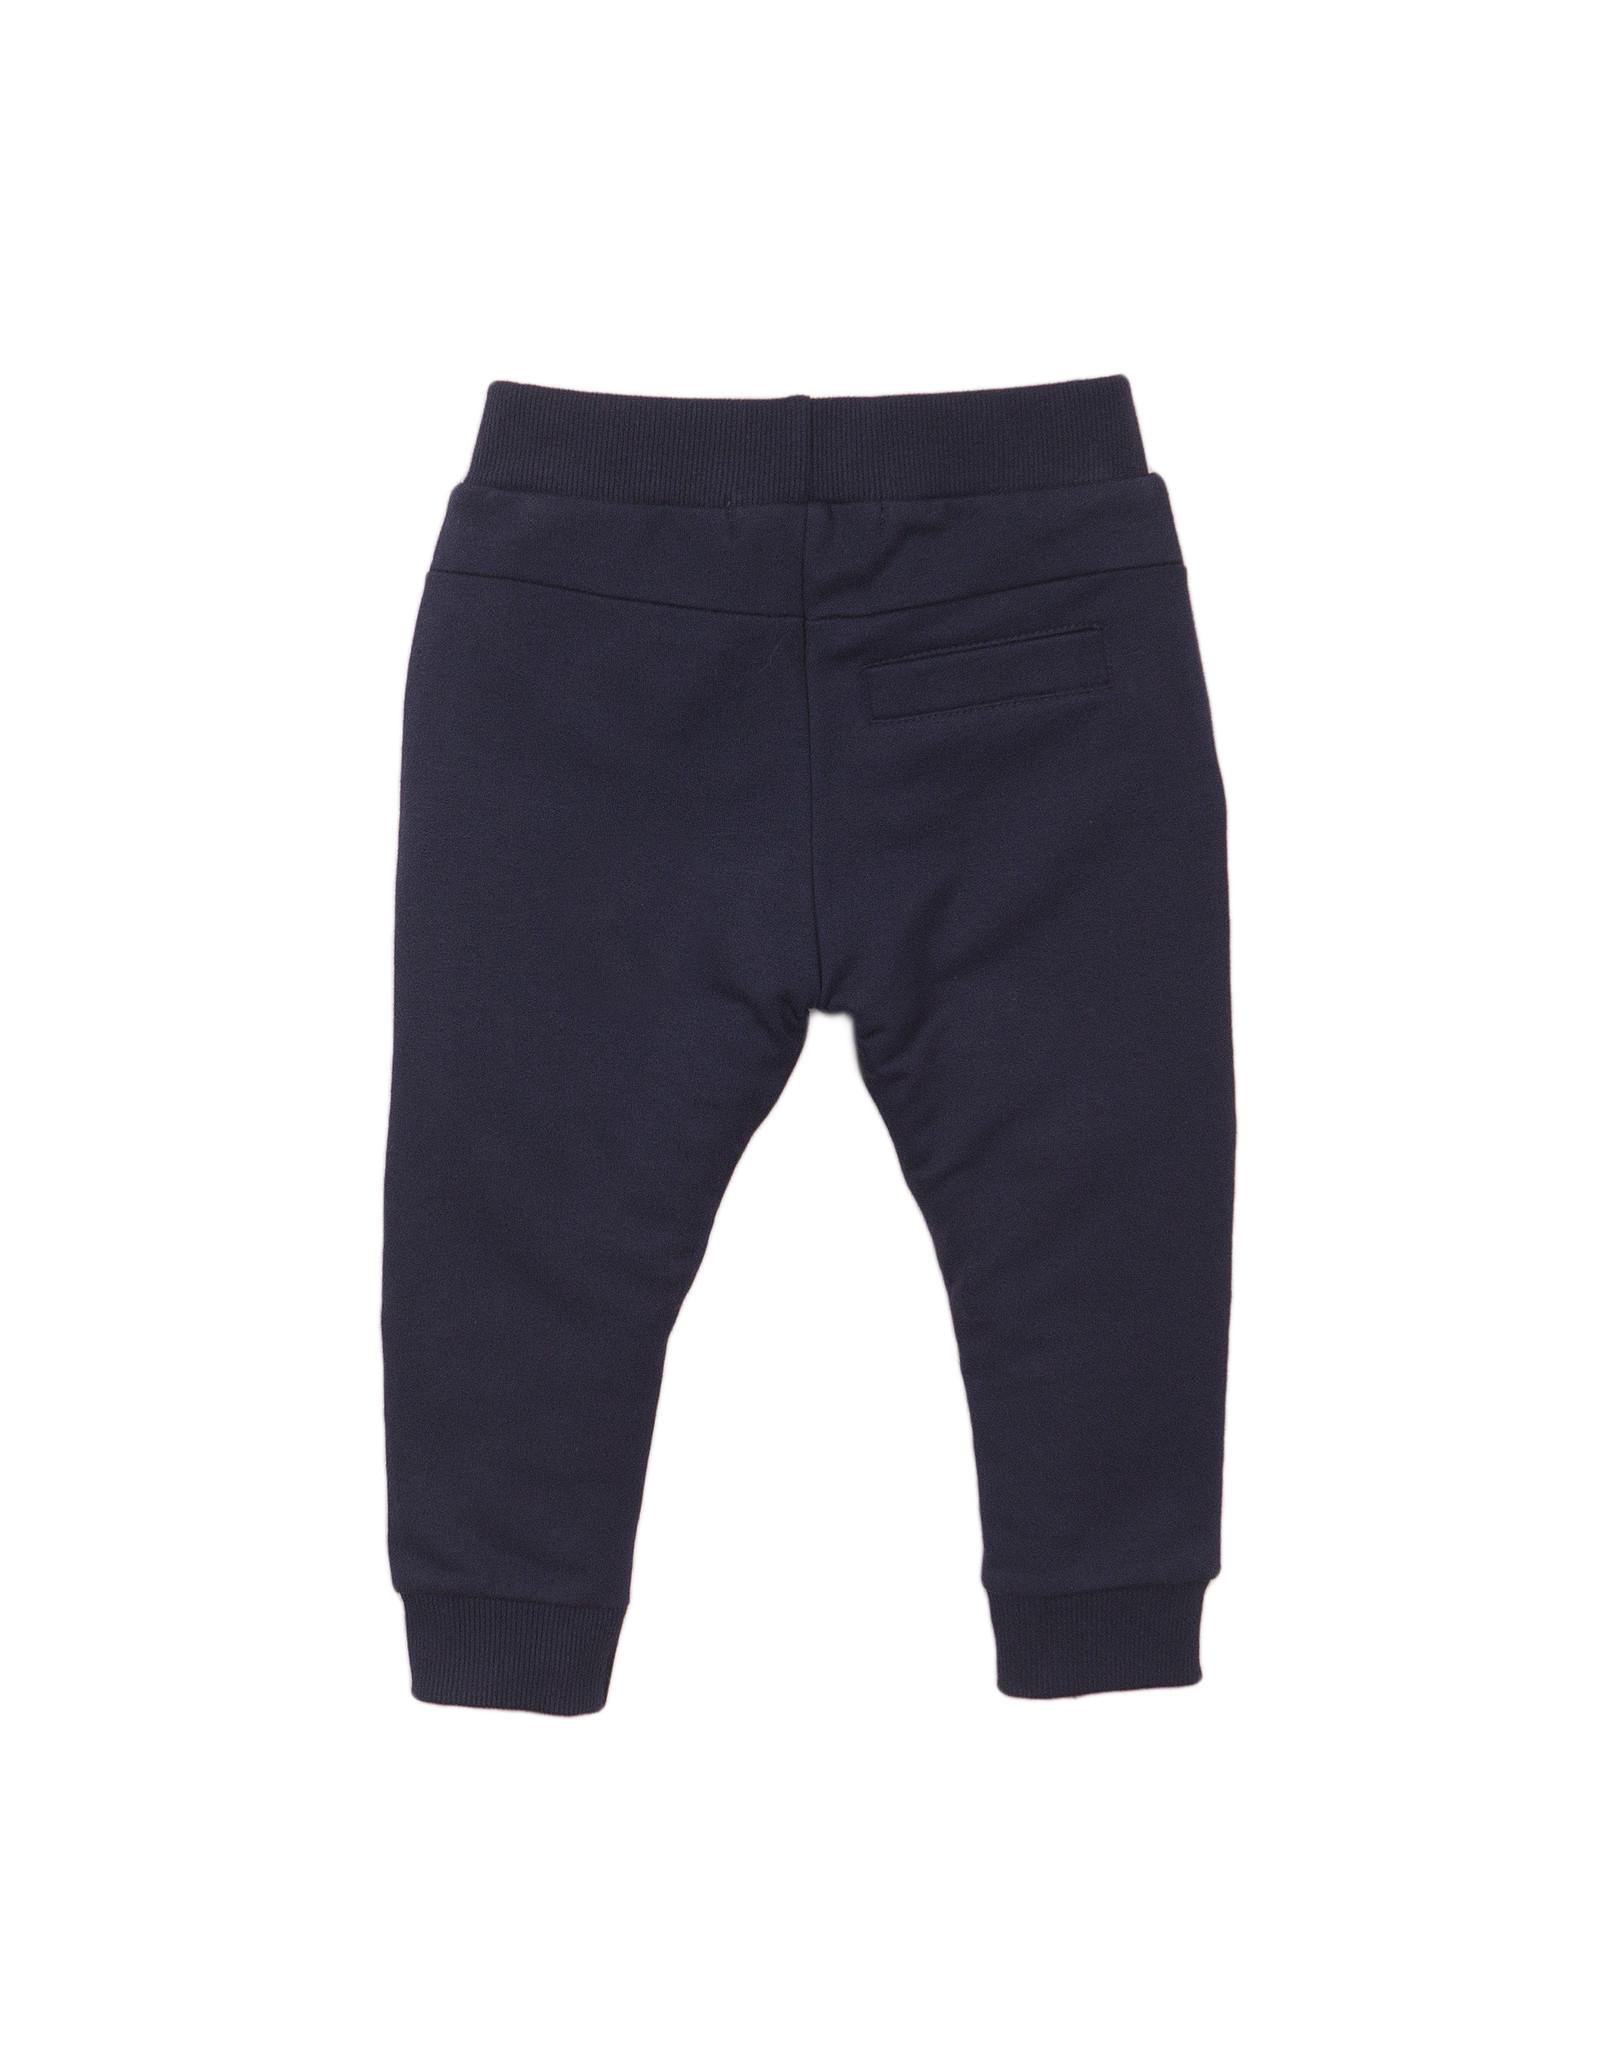 Koko Noko Jogging trousers, Navy, SS21